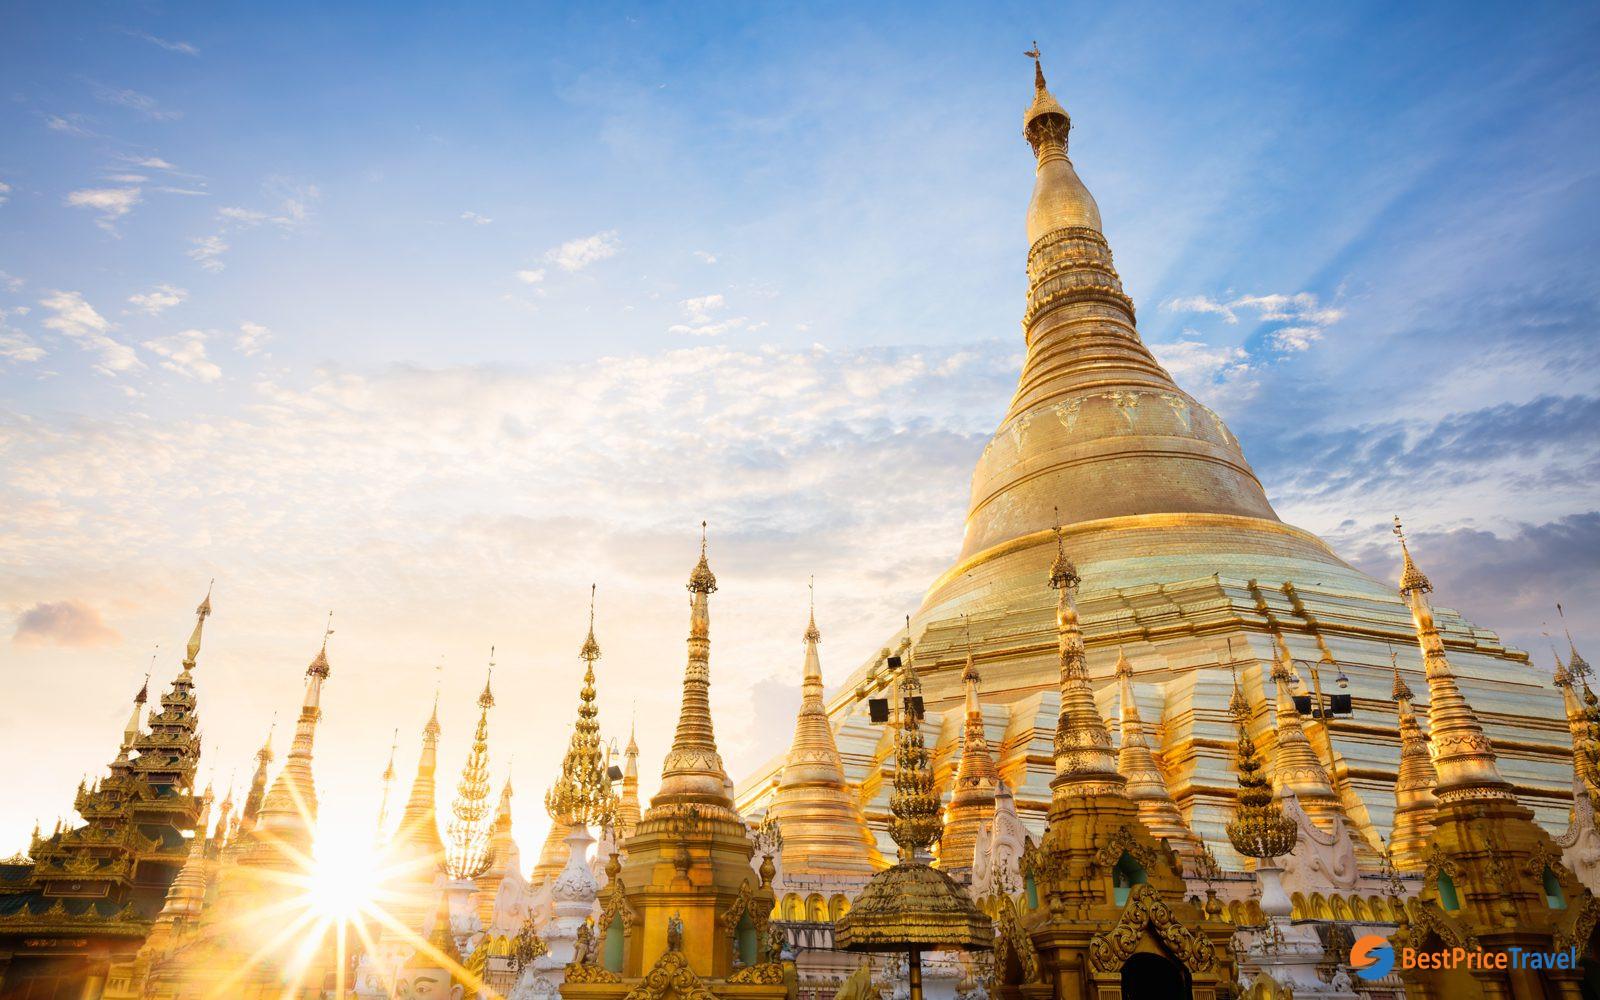 The beautiful glow shining on Shwedagon Pagoda